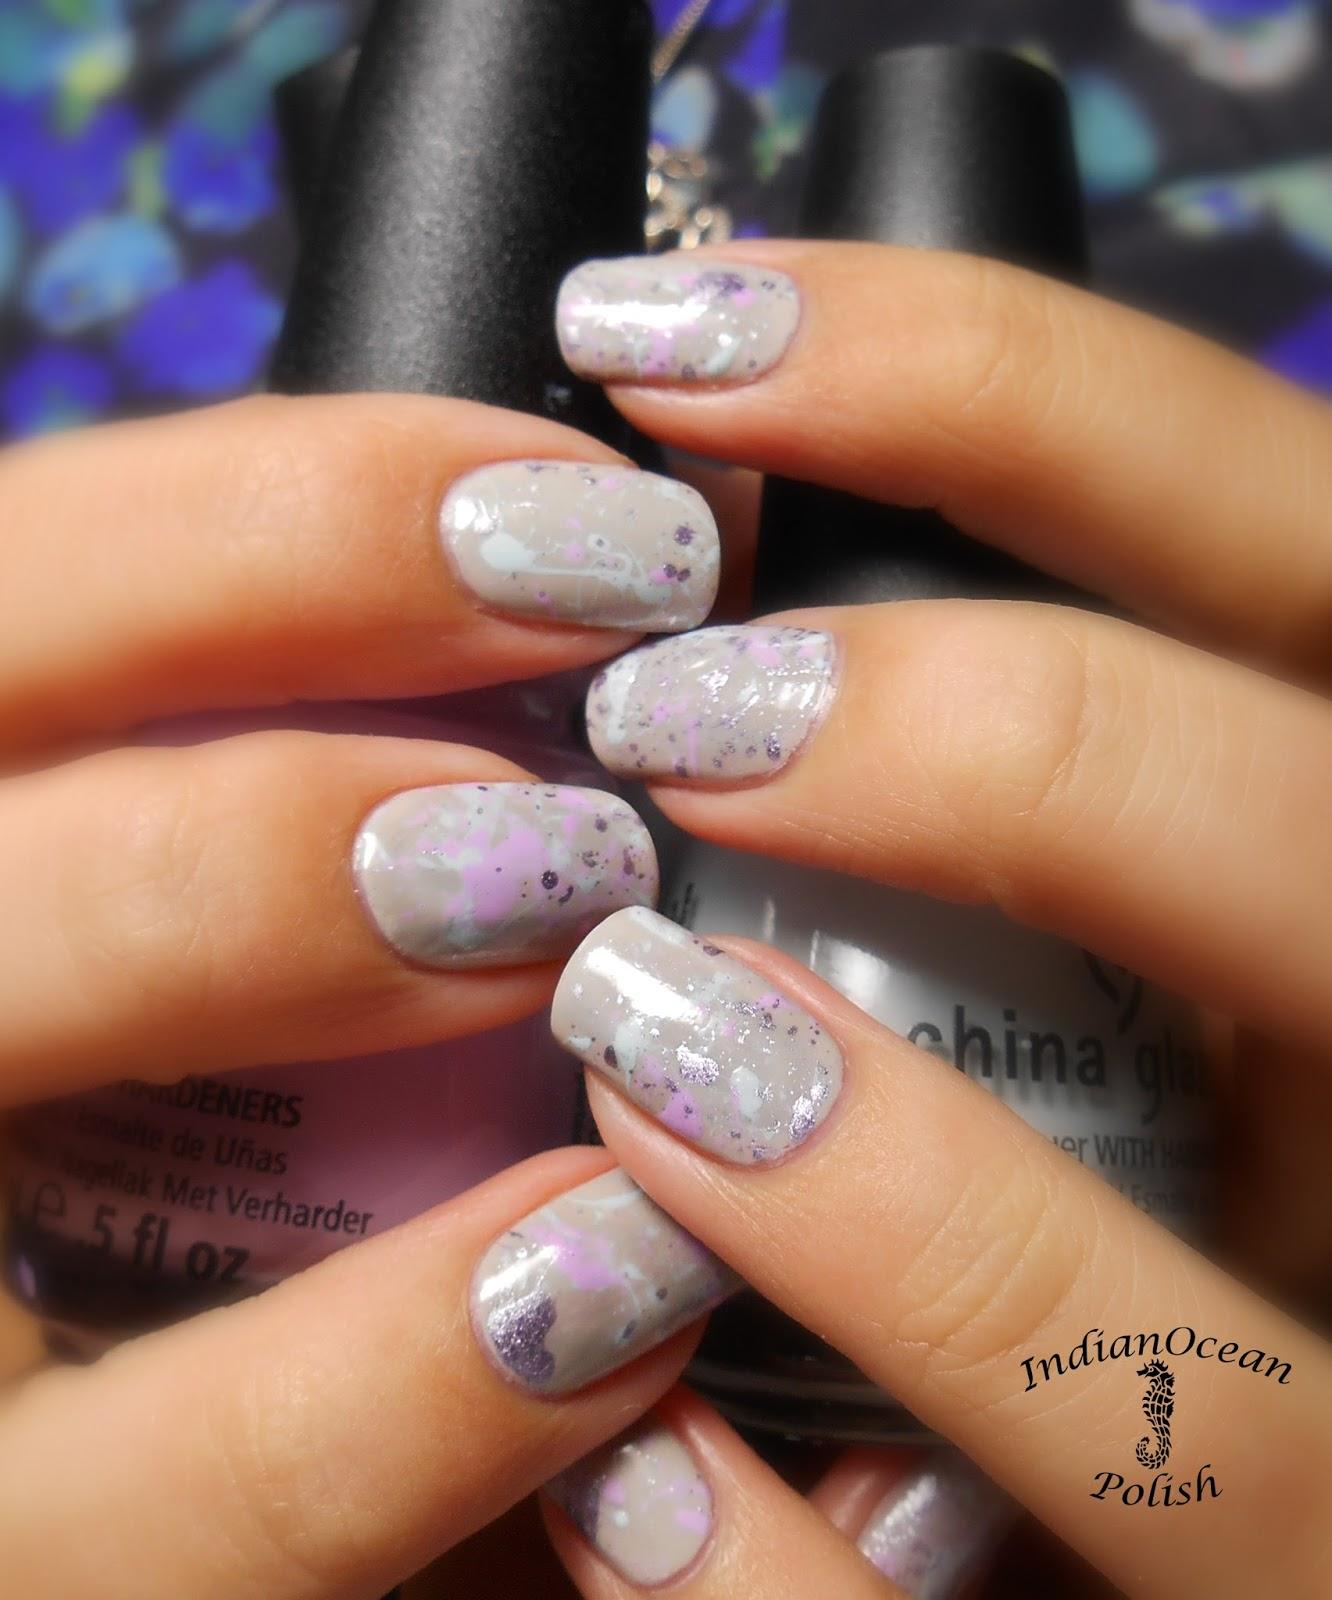 Indian Ocean Polish Colour Blocking Nails With Opi Fly: Indian Ocean Polish: Pastel Paint Splatter Nail Art Tutorial